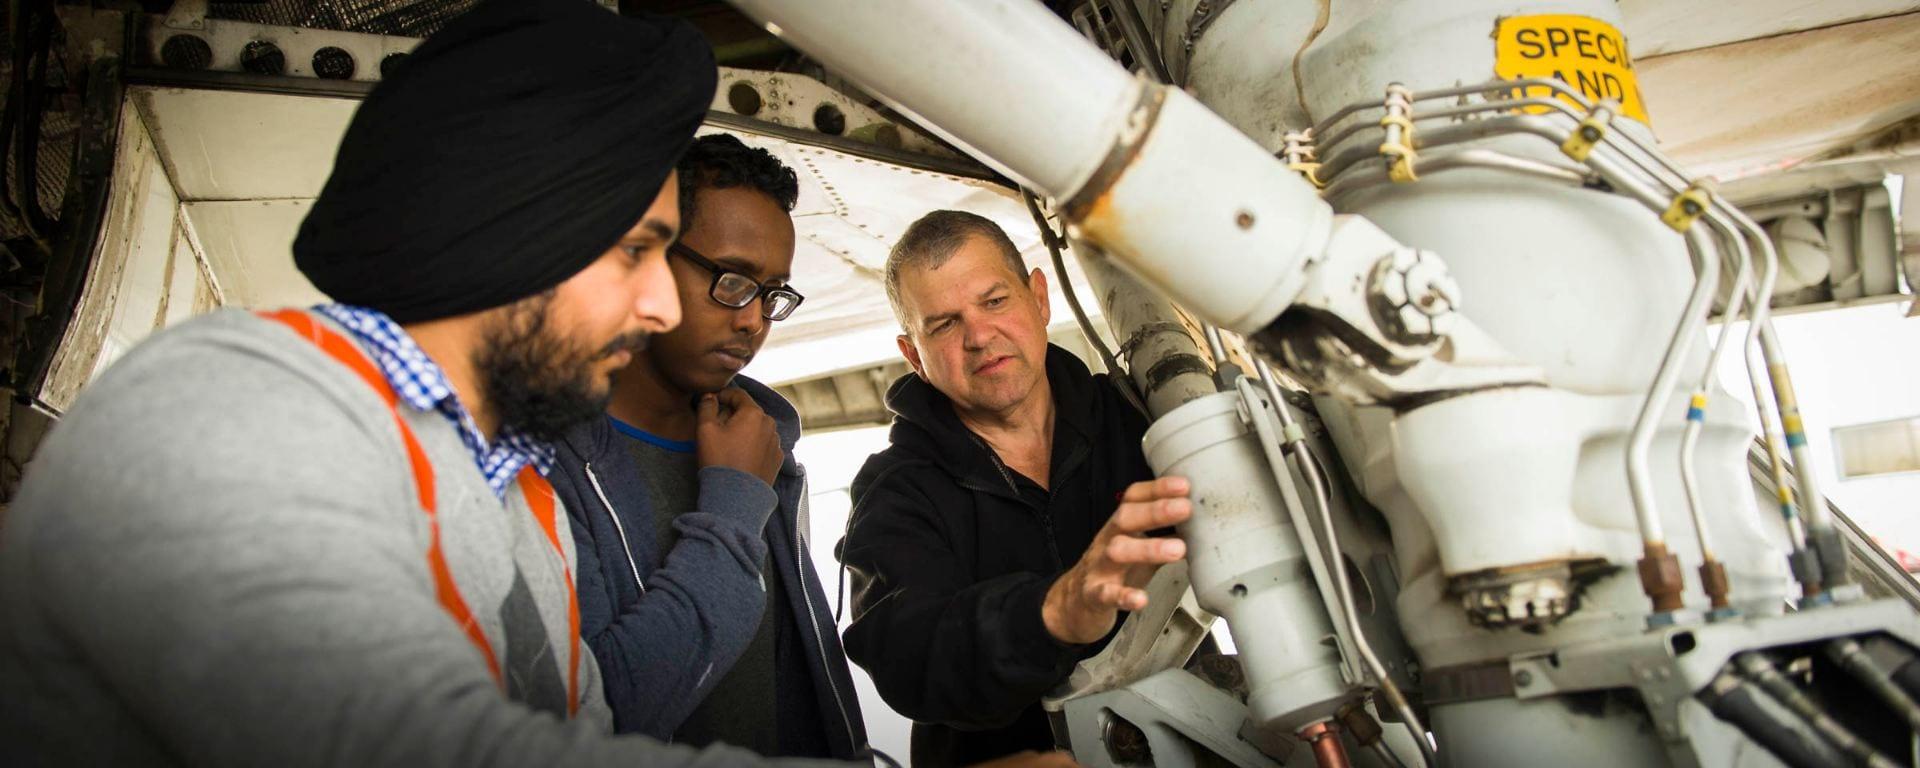 Aircraft Maintenance Engineer - Apprenticeship